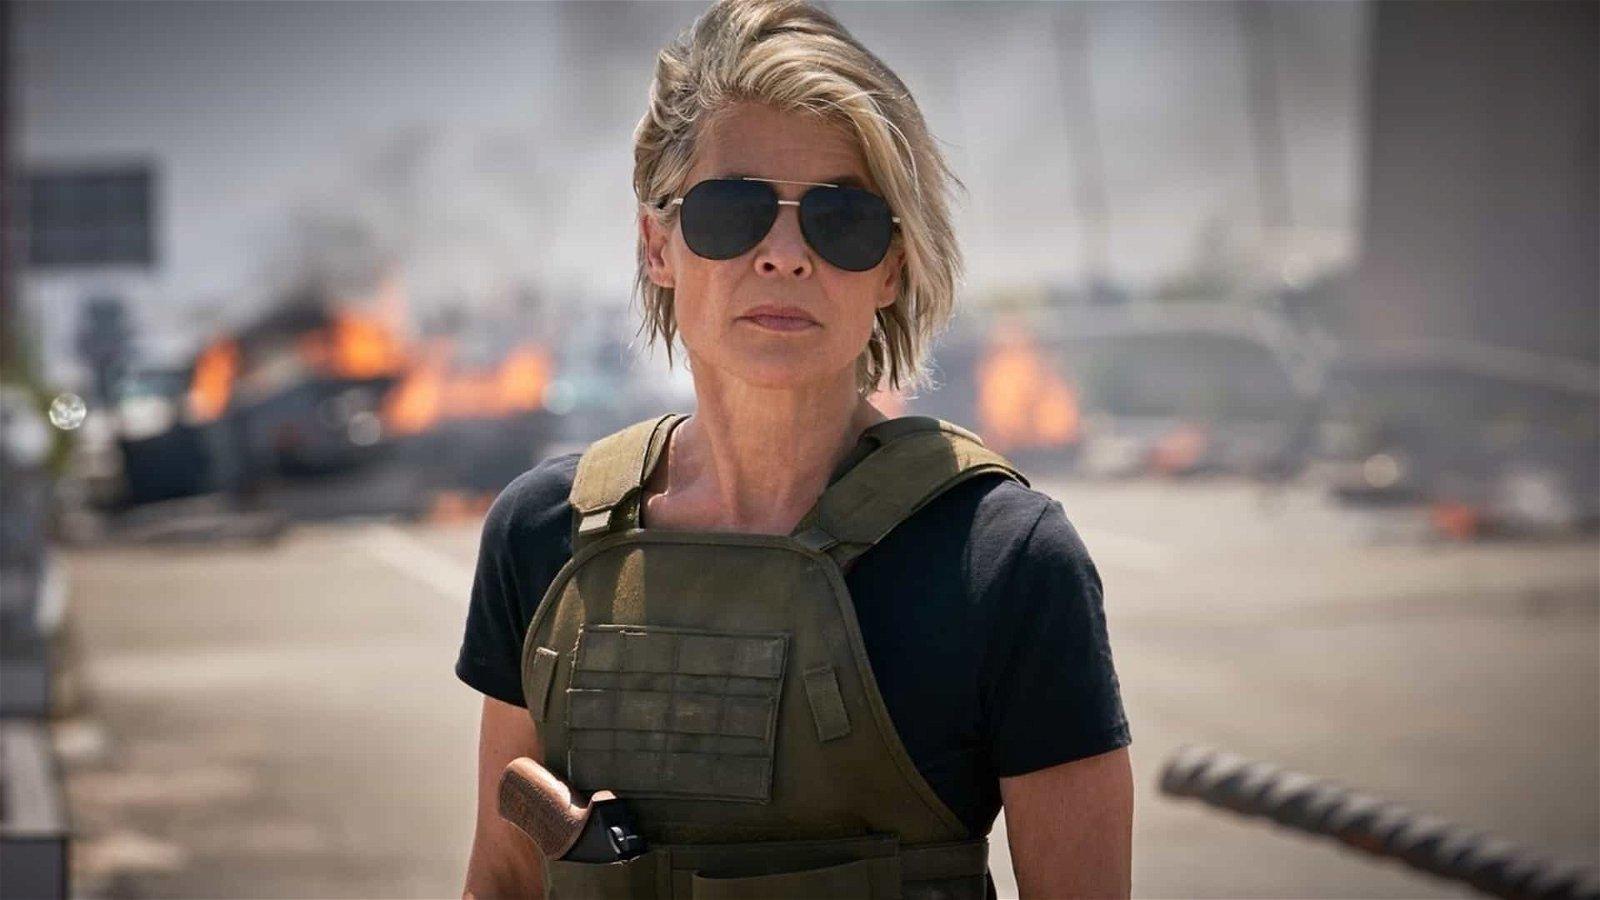 Trailer Teased for 'Terminator: Dark Fate' Featuring Sarah Connor 1